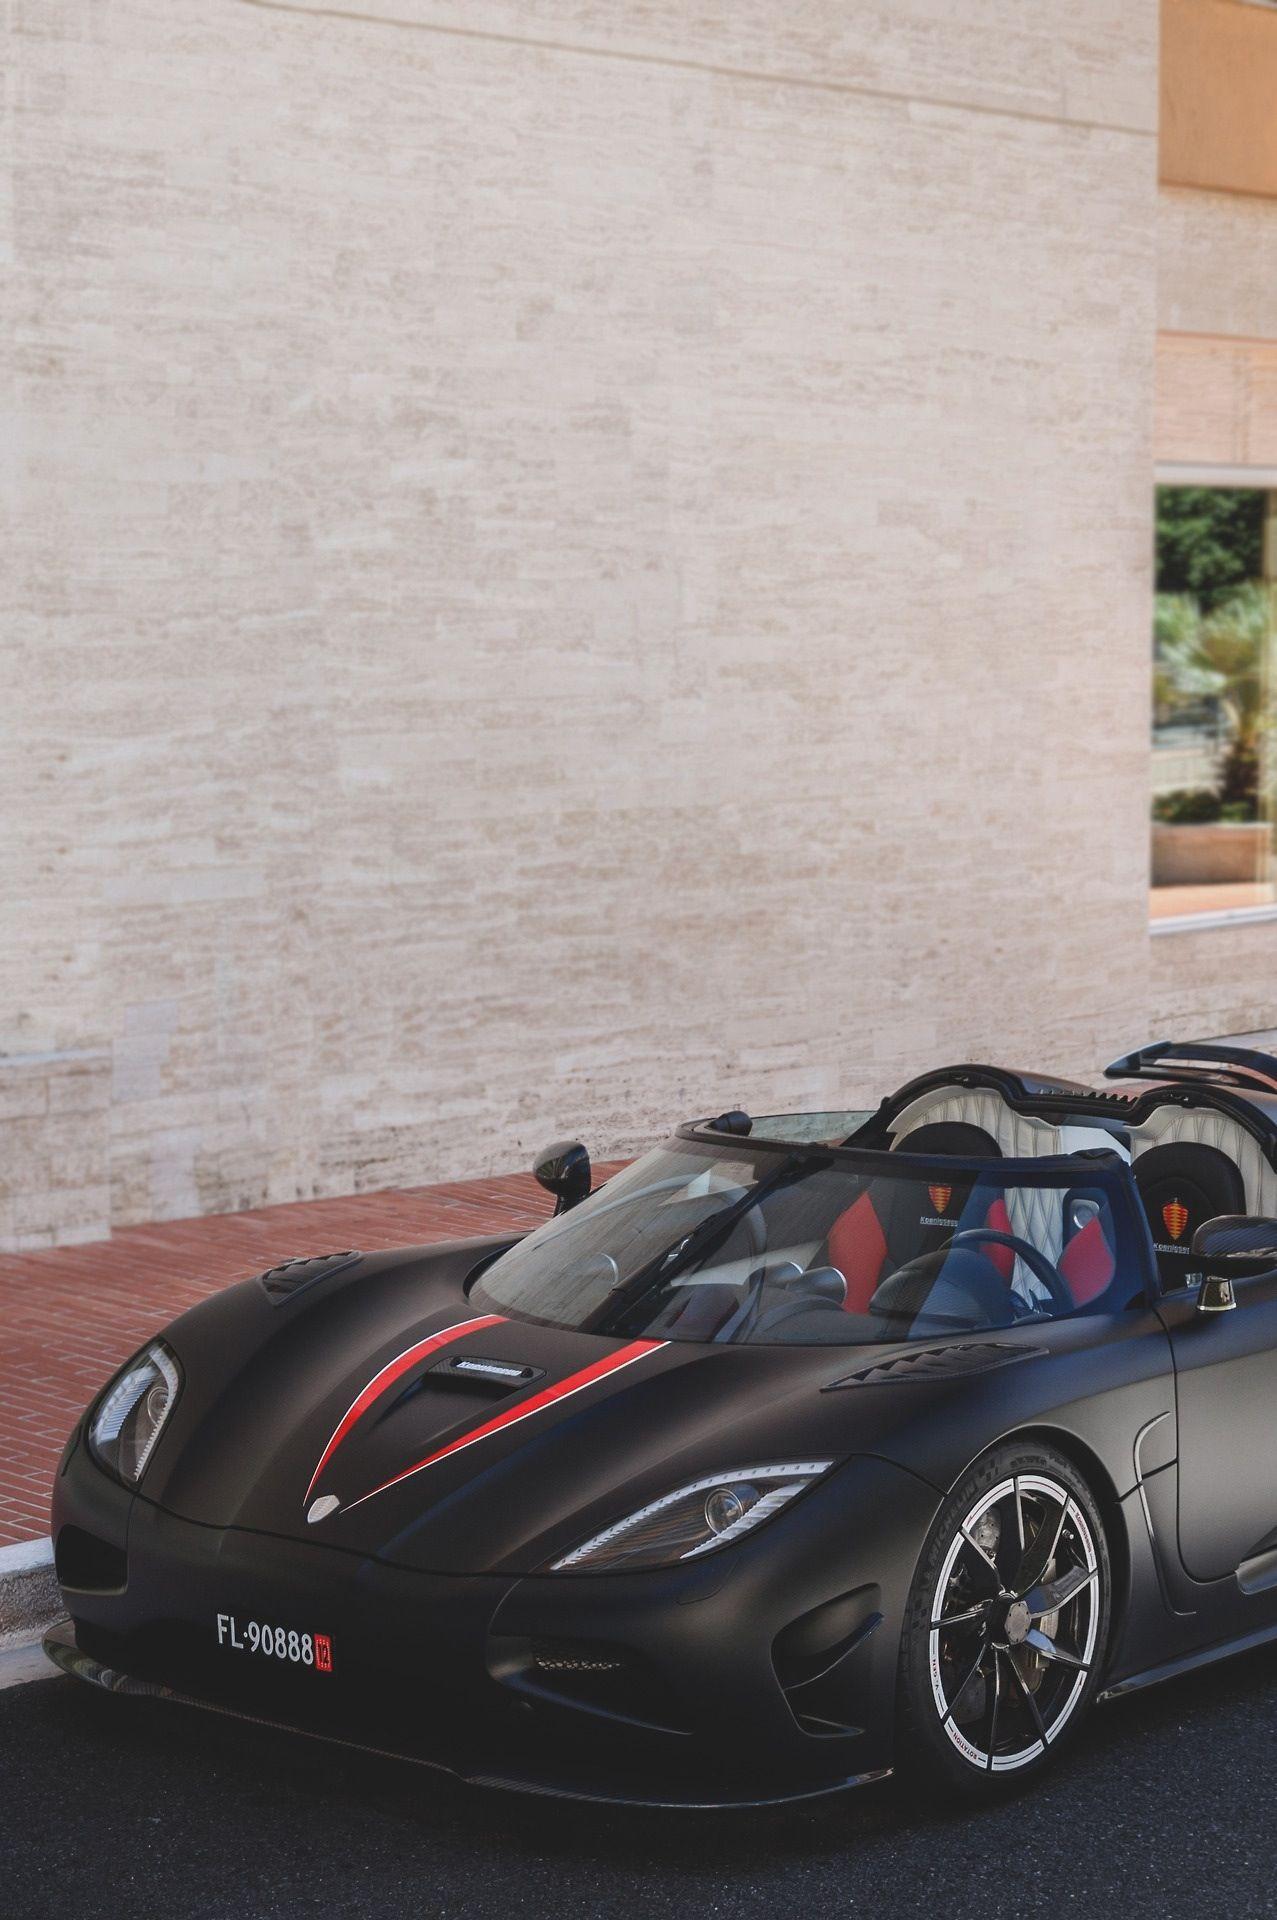 Super Cars Super Cars Dreamcars Supercars Phatrides Sportscars Mobil Sport Mobil